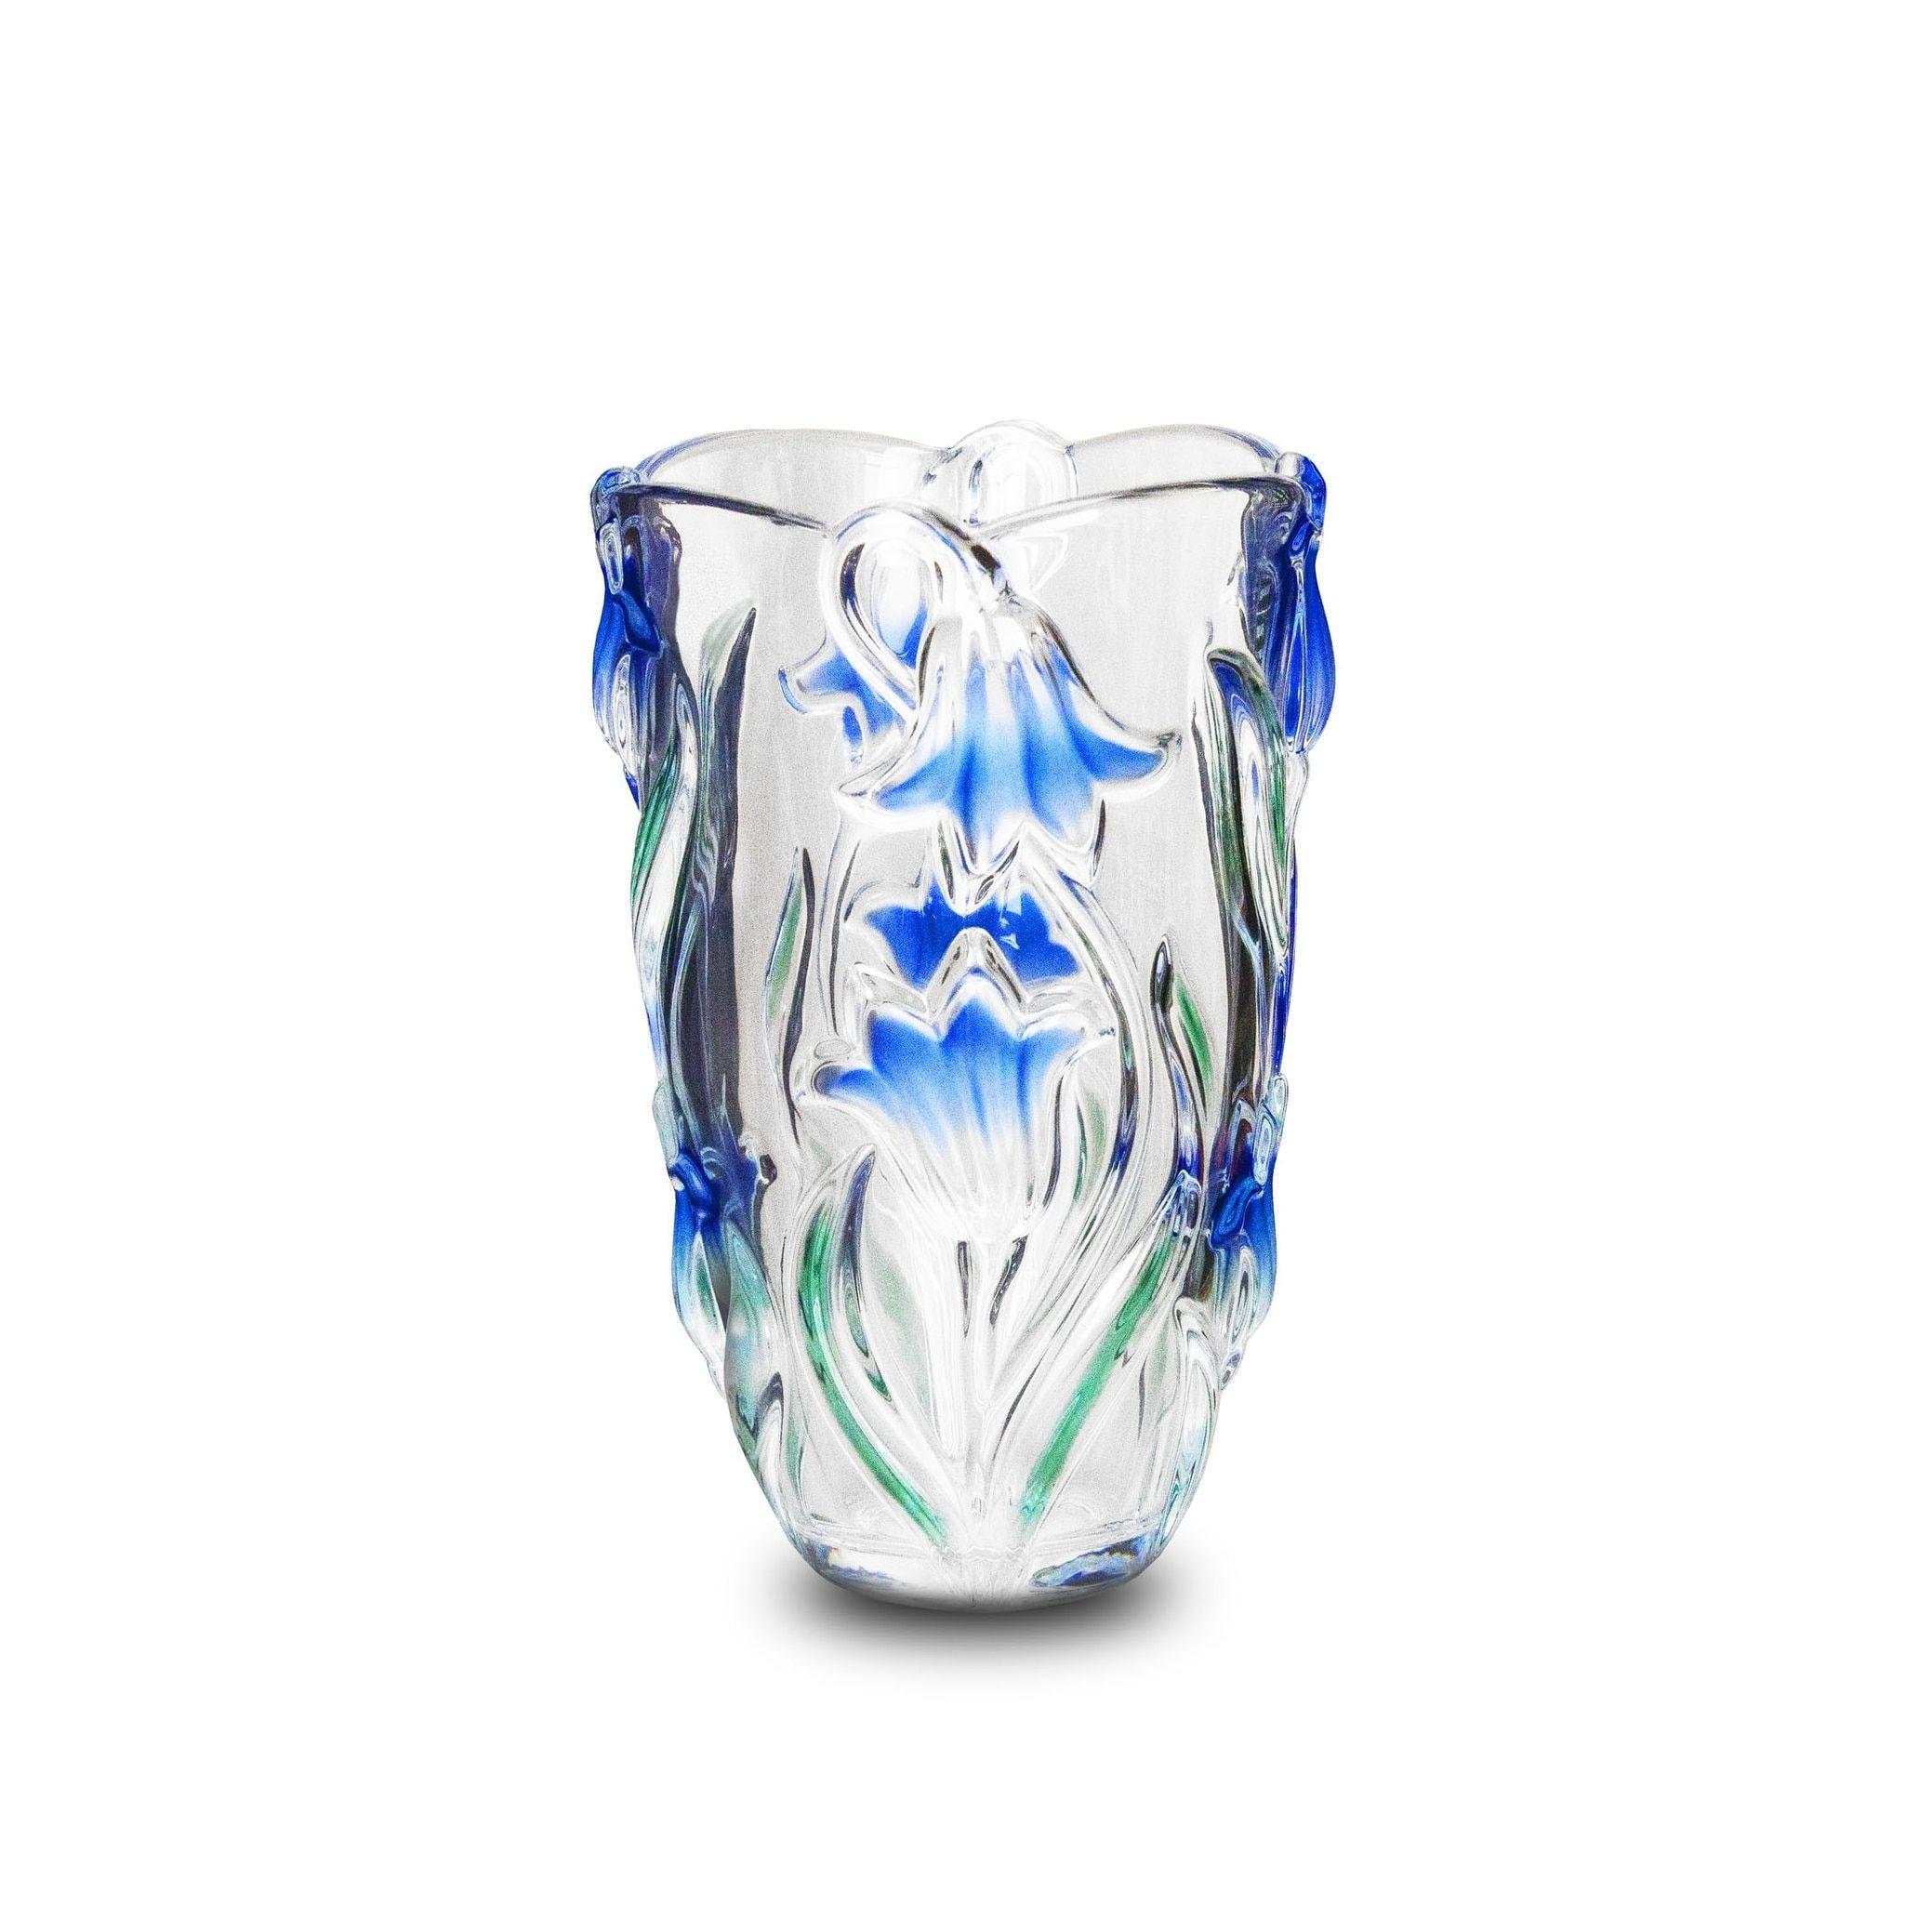 turquoise vase set of studio silversmiths blue danube collection crystal vase products regarding studio silversmiths blue danube collection crystal vase